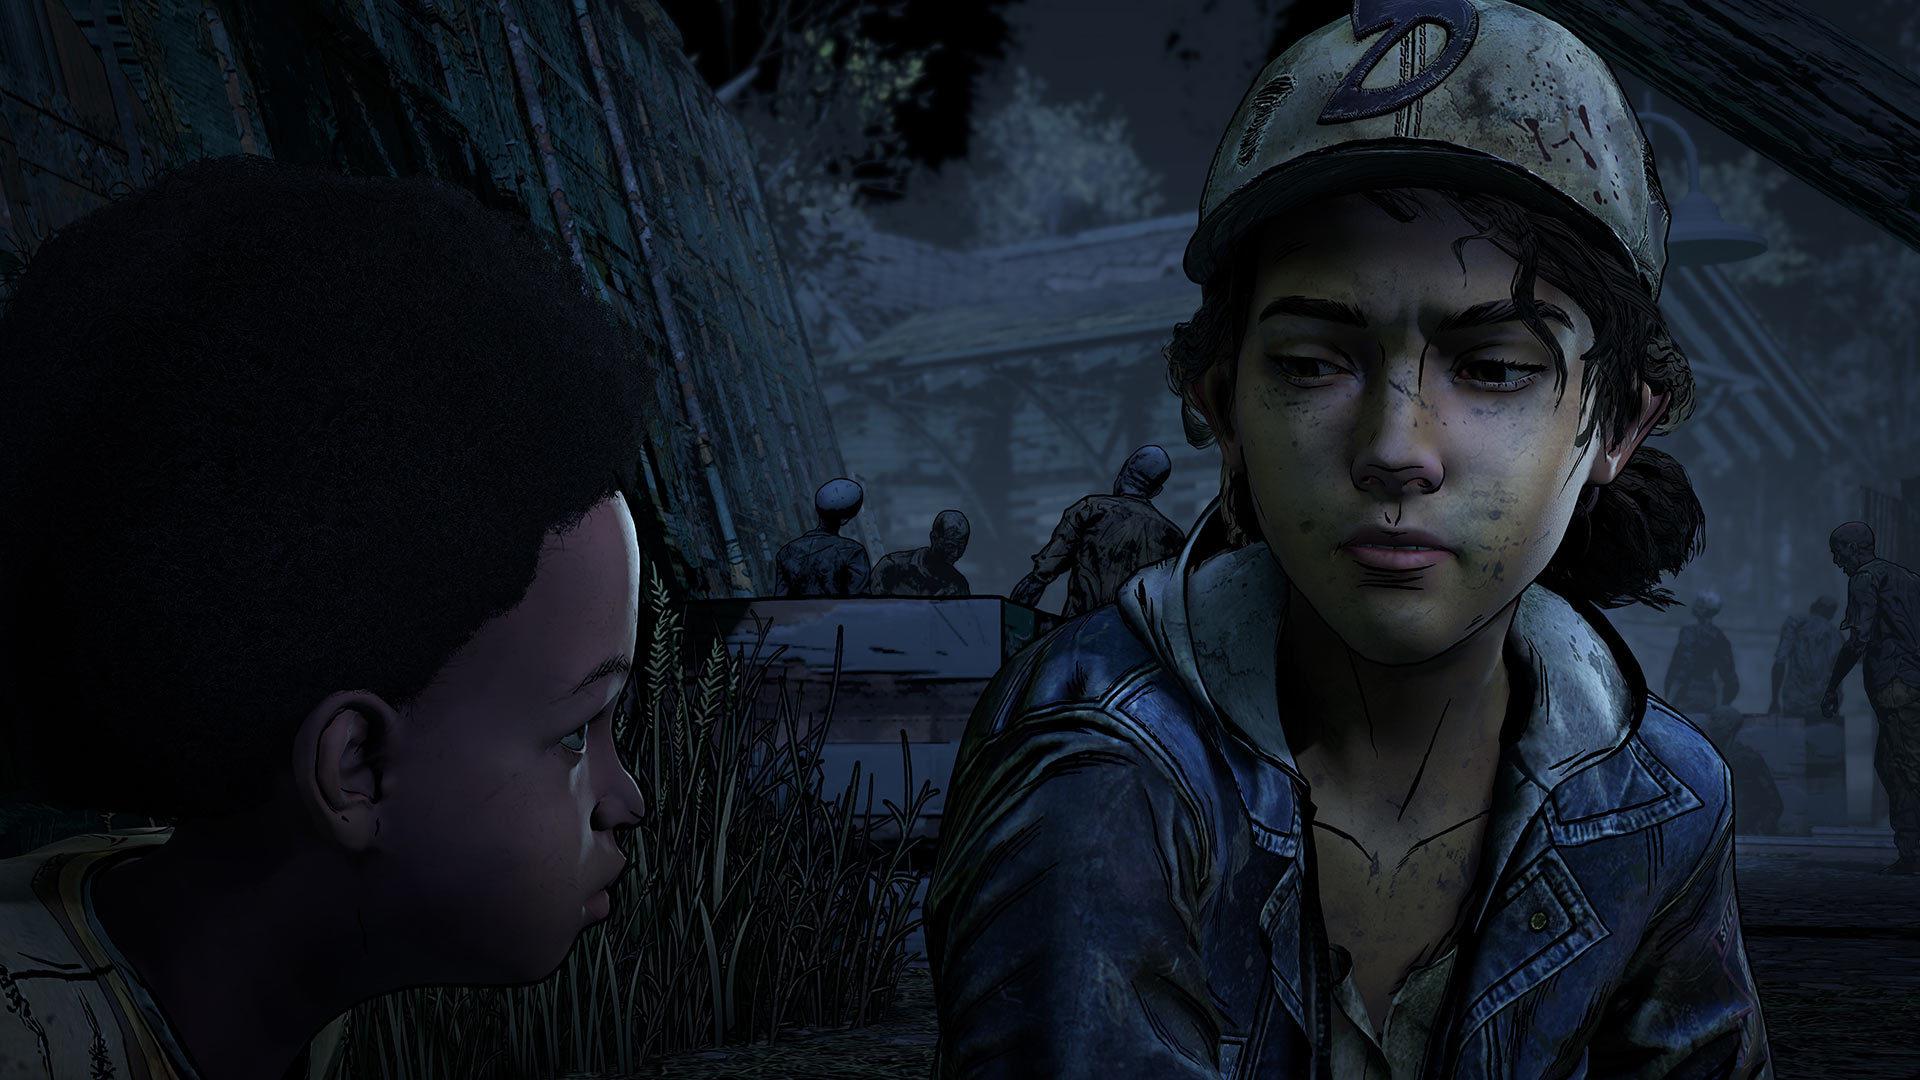 سی دی کی اریجینال استیم بازی The Walking Dead: The Final Season